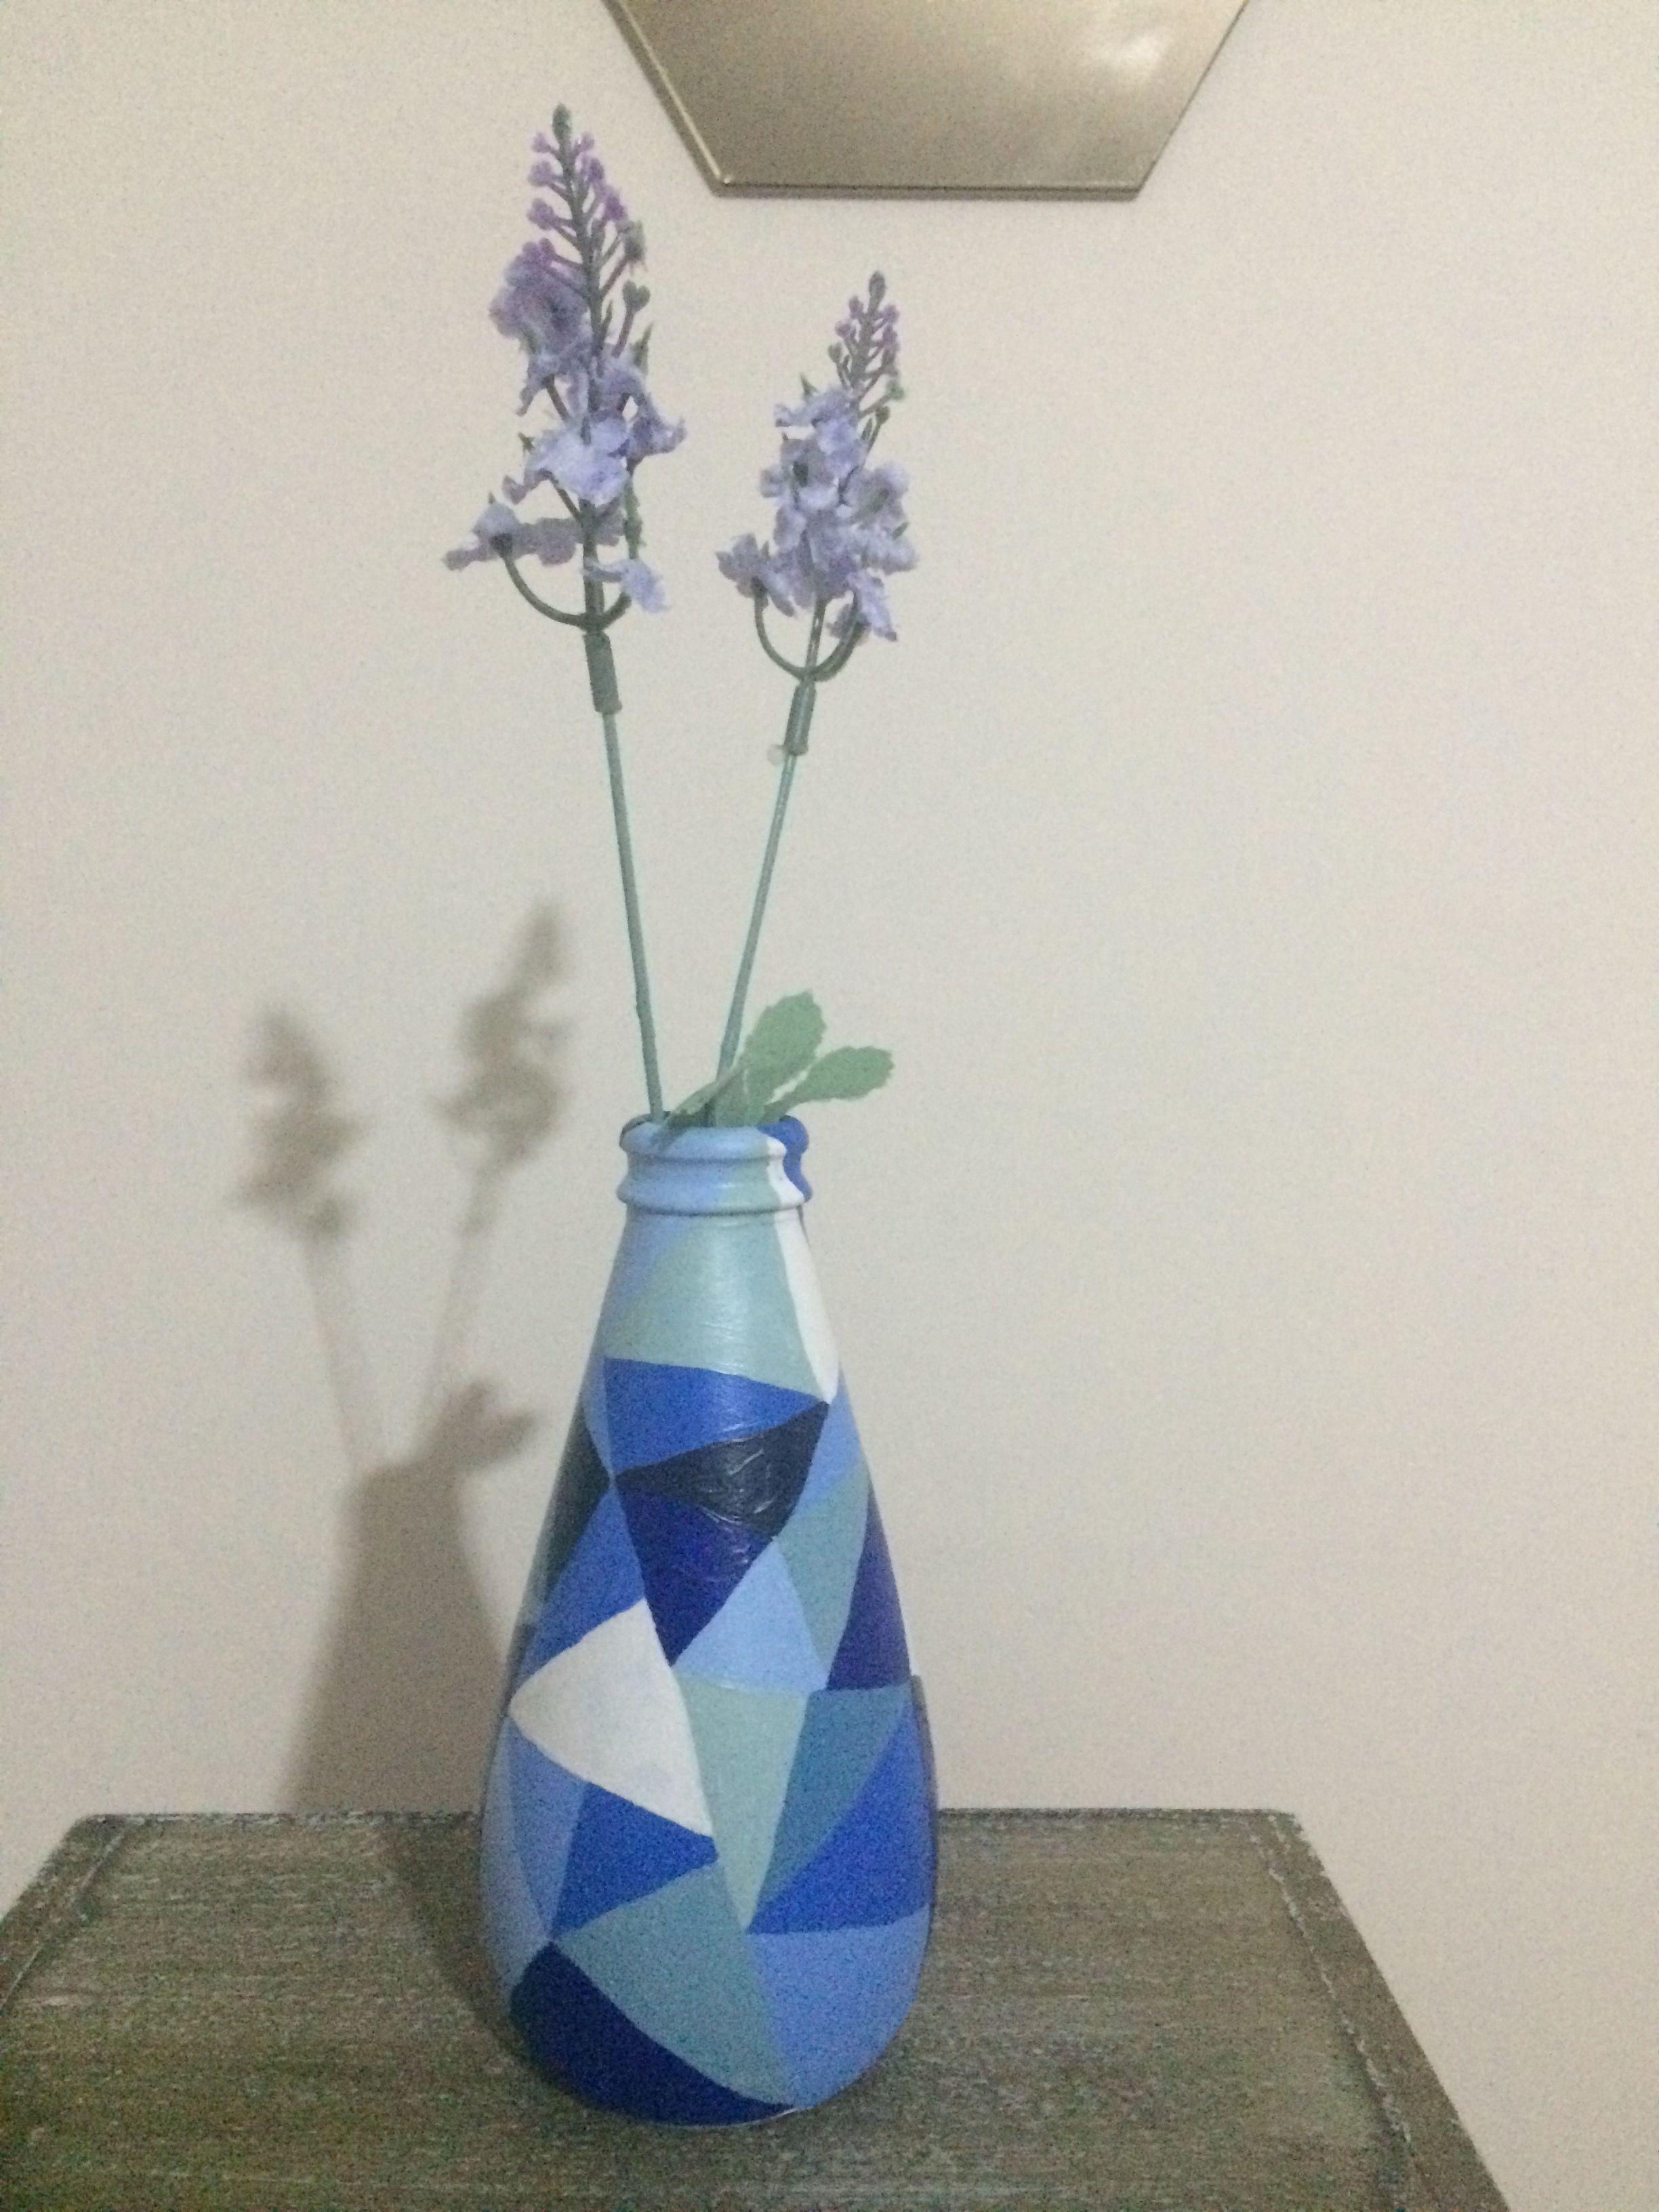 Vazo Sise Boyama Art Artcraft Avsar Soda Sisesi Glass Painting Vazolar Painting Sise